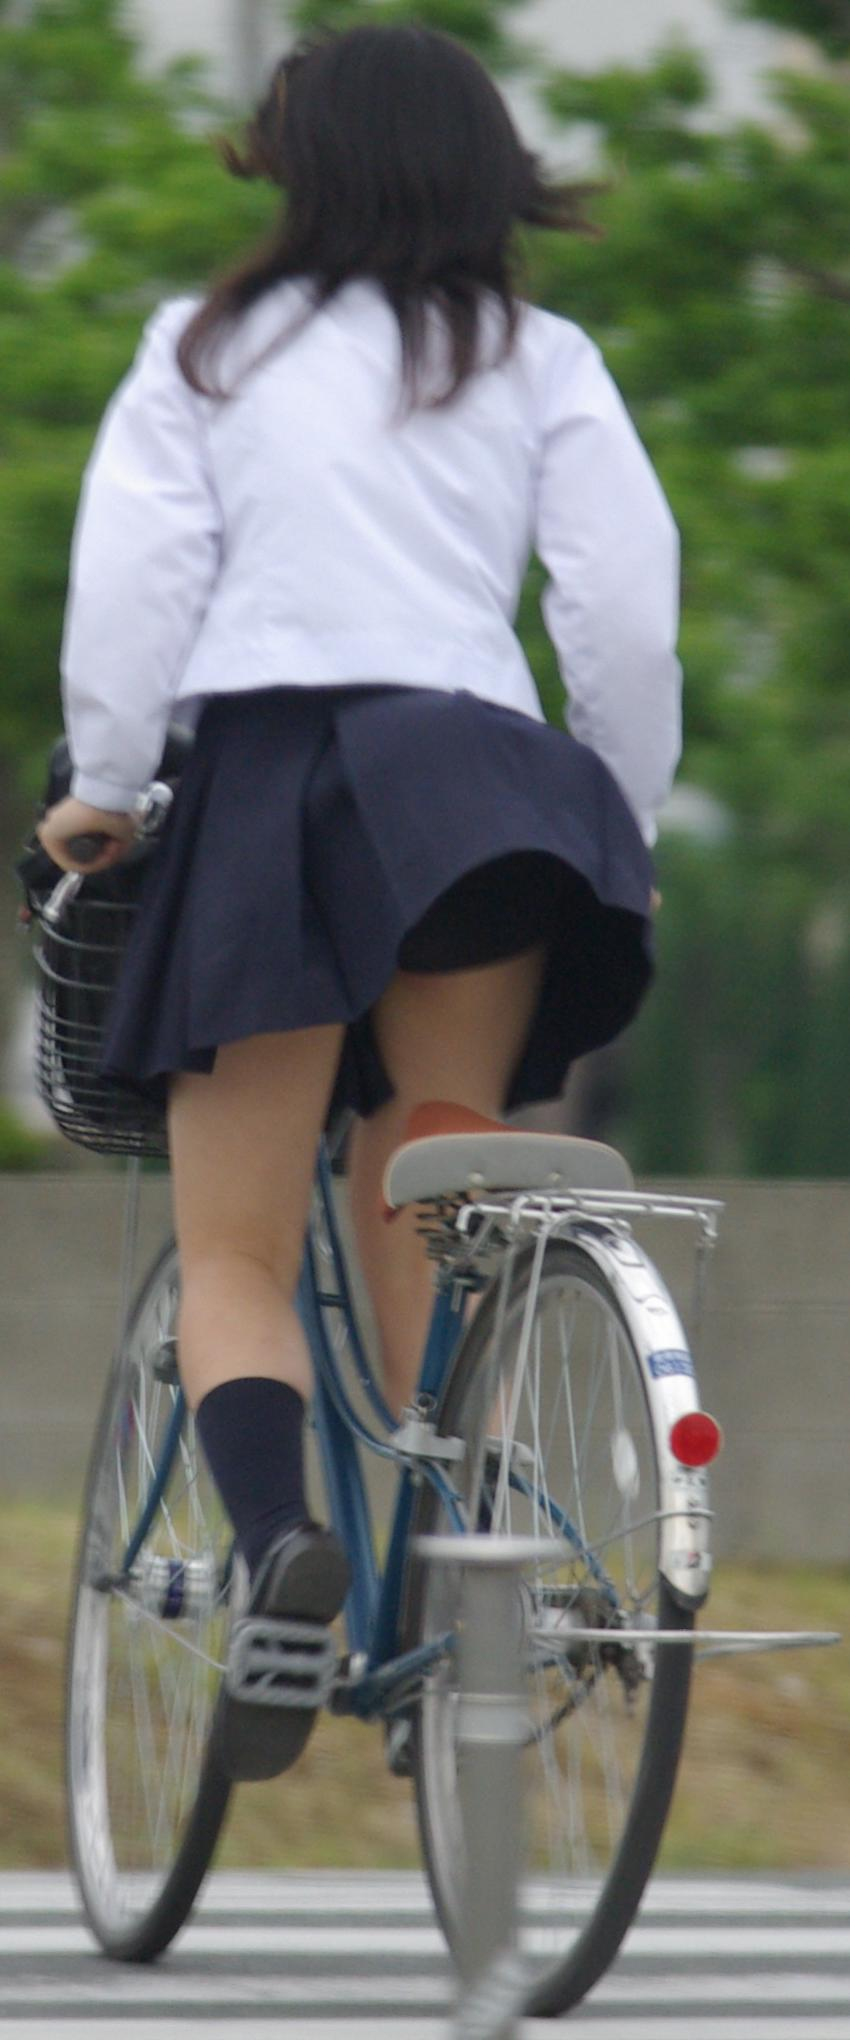 【JKパンチラ画像】通学途中のアクシデントwwwチャリンコ乗ったJKたちのパンチラ 11